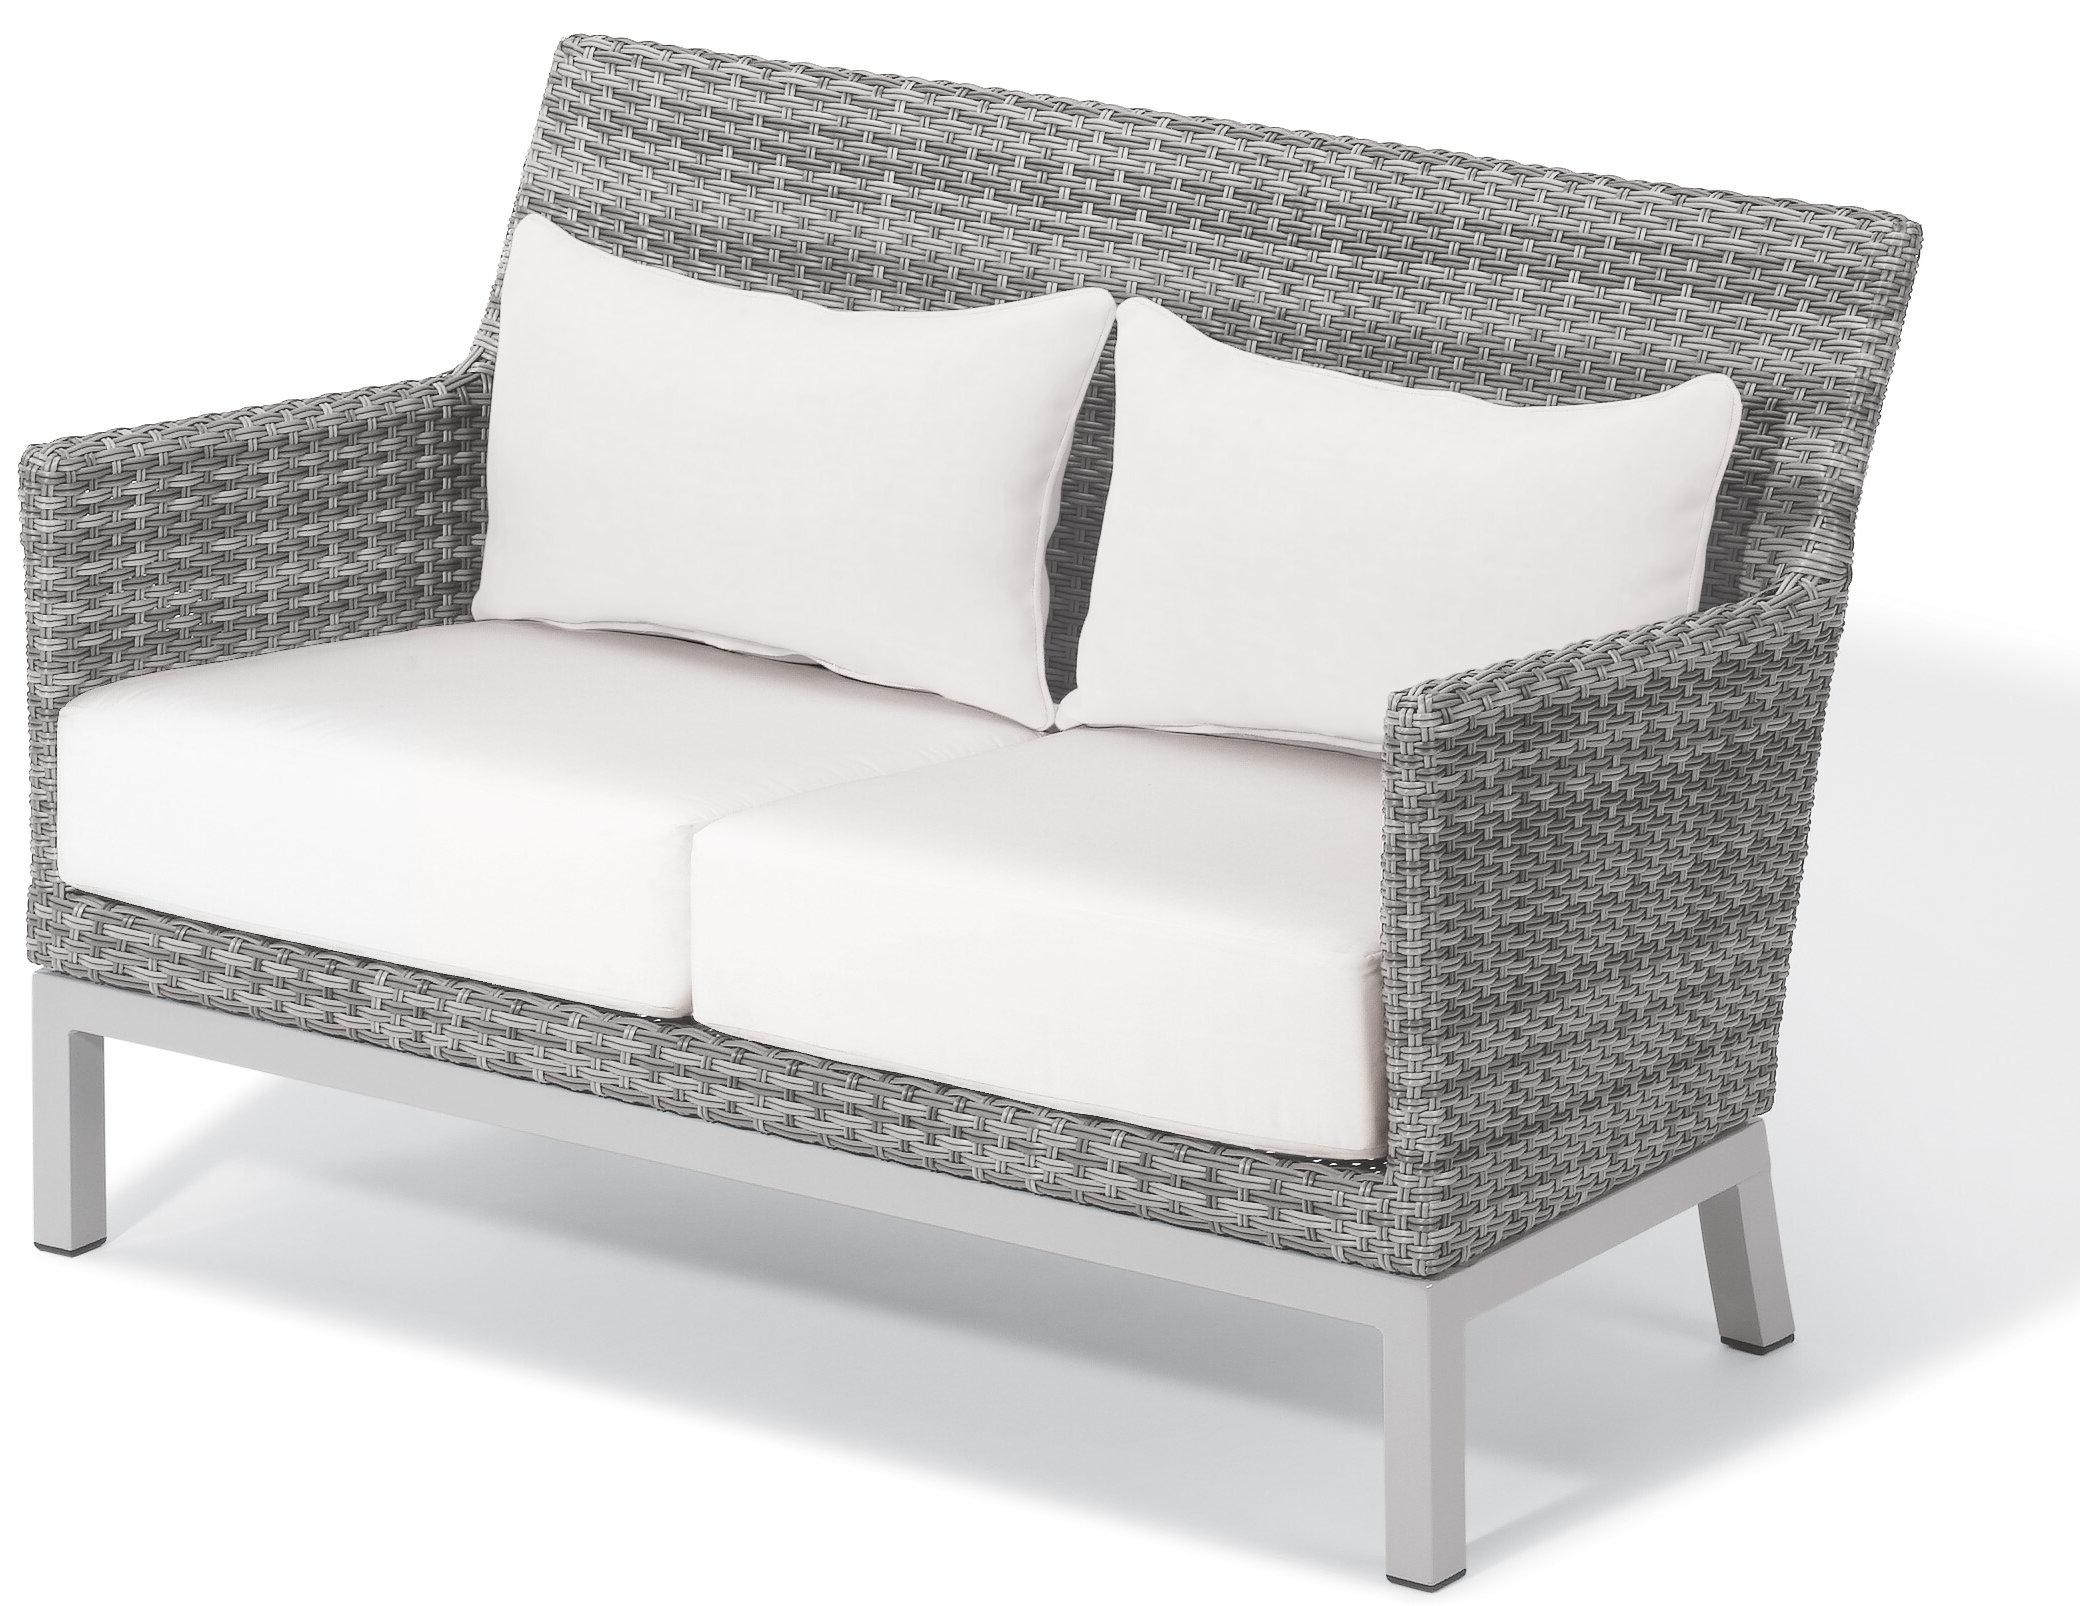 Saleem Loveseat With Cushions Regarding Recent Wakeland Wicker Loveseats With Cushions (View 7 of 25)